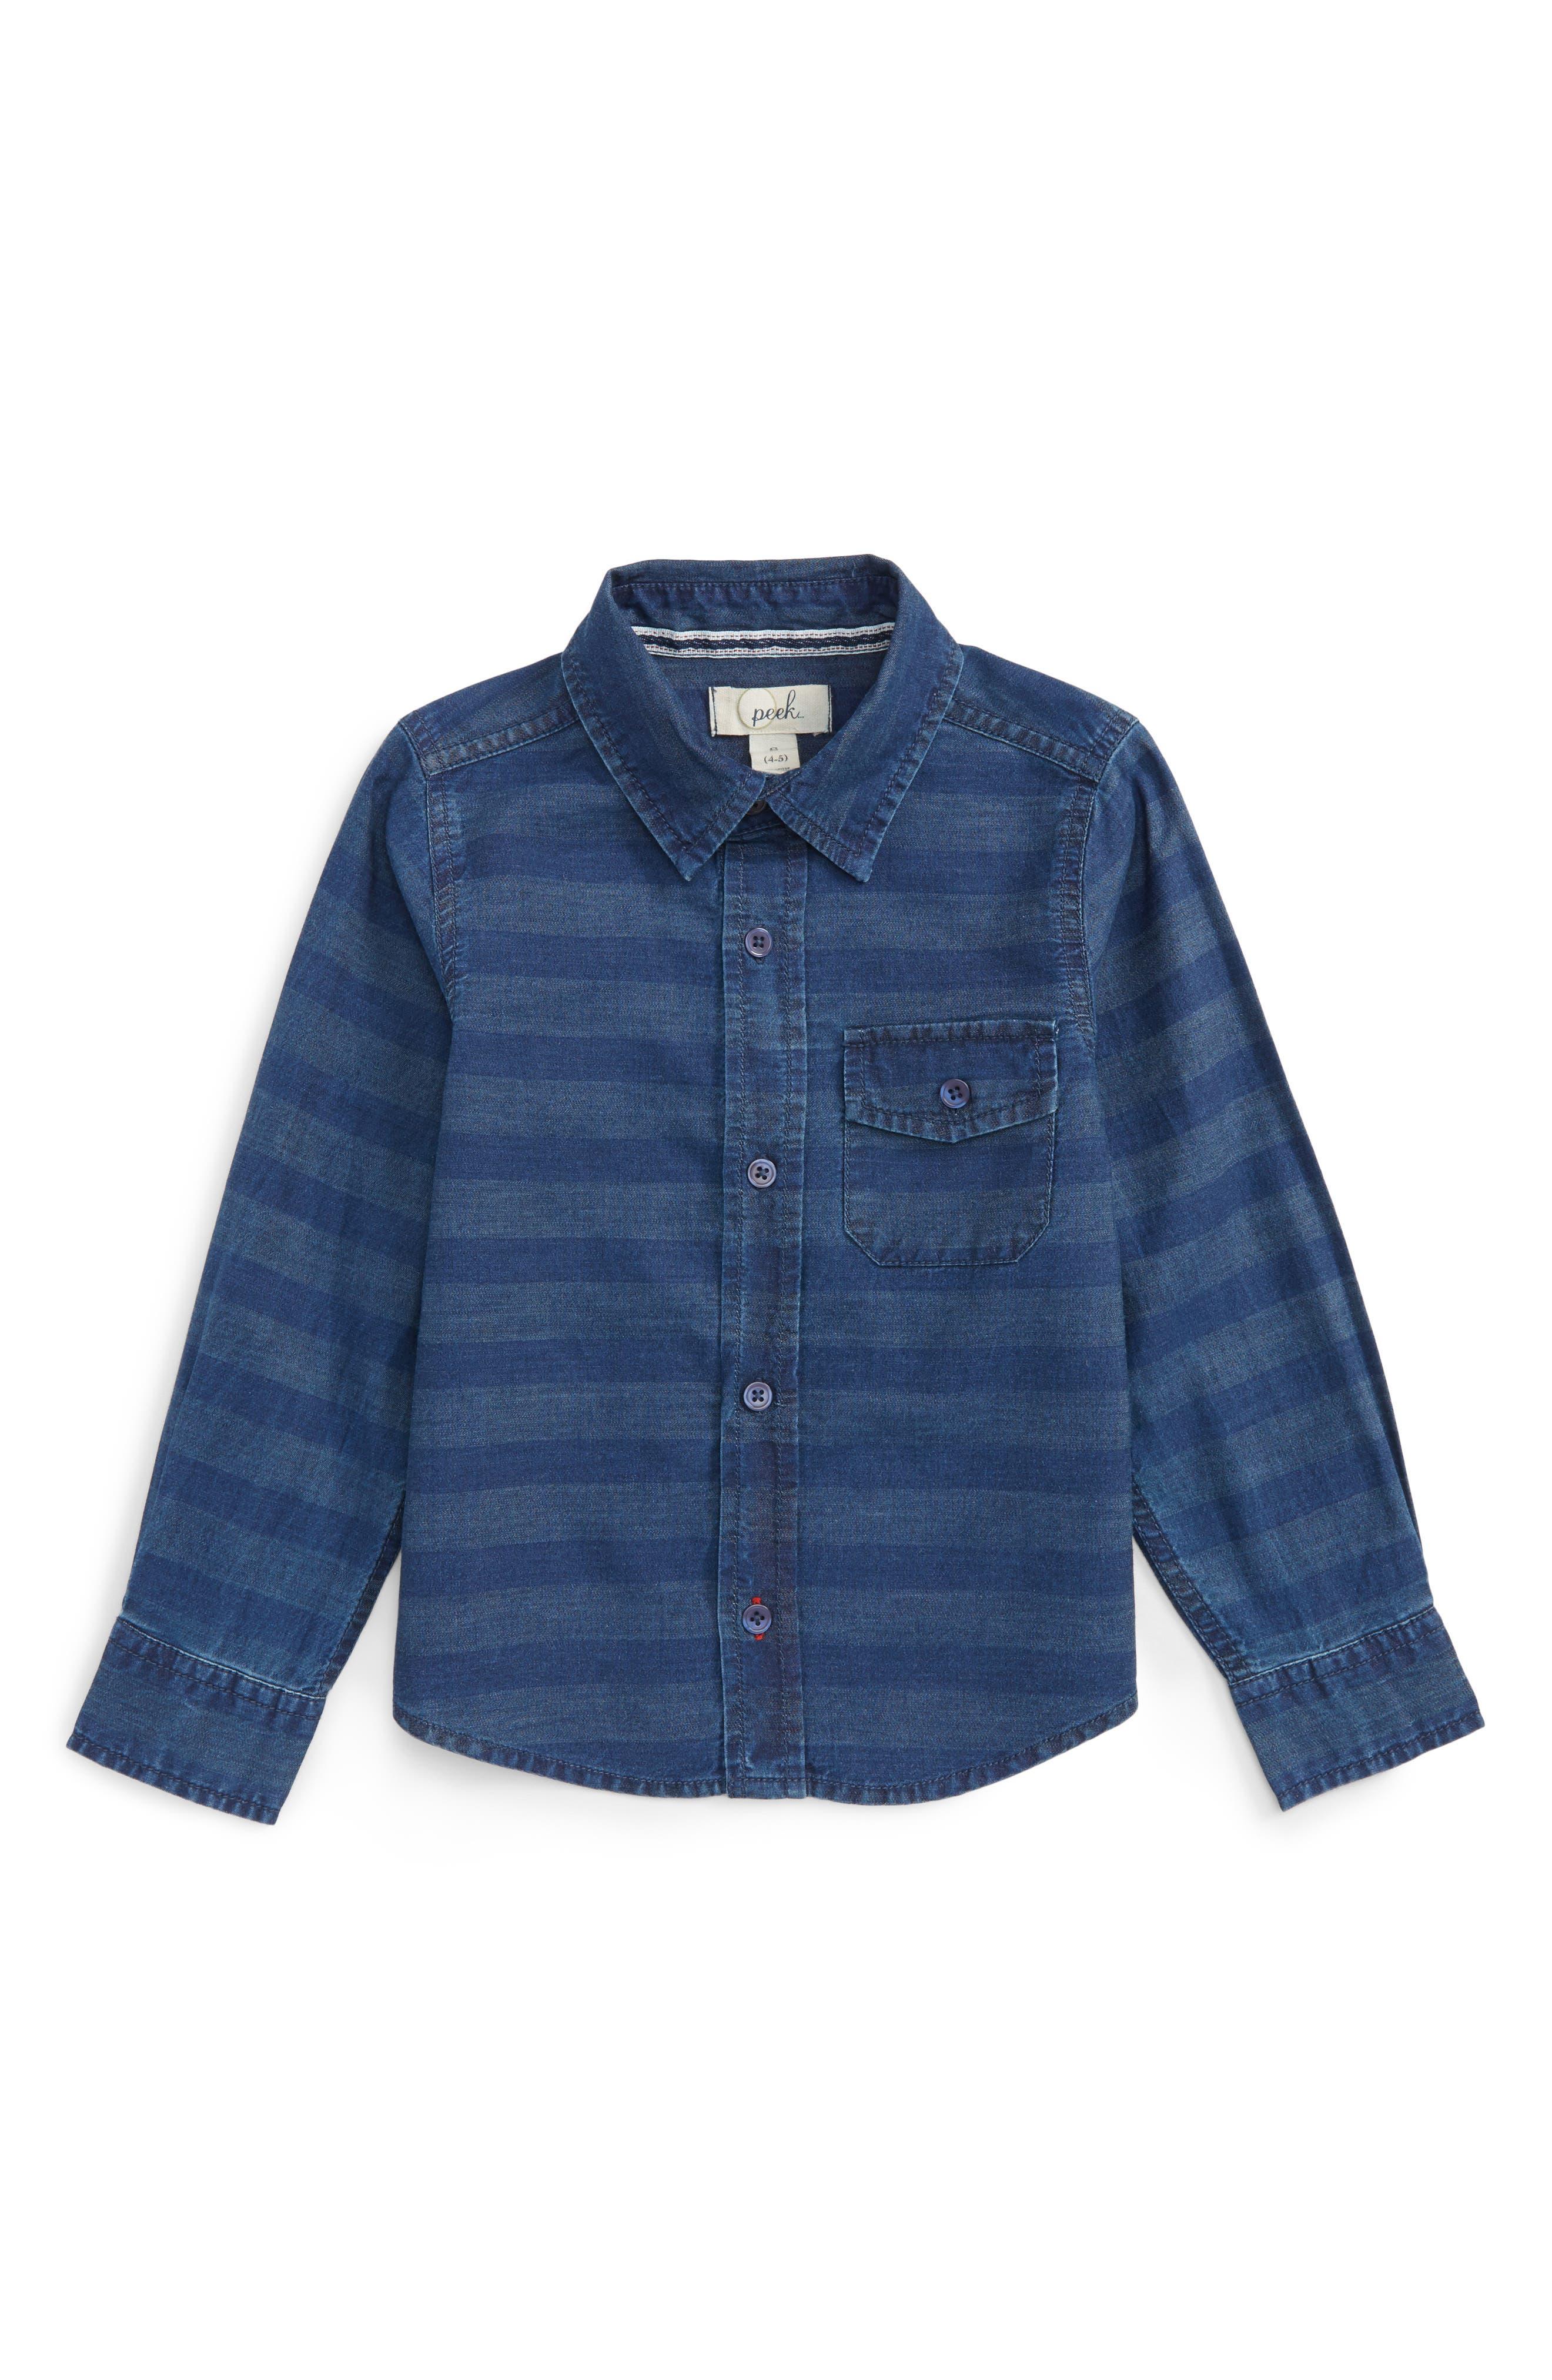 Peek Aiden Stripe Chambray Shirt (Toddler Boys, Little Boys & Big Boys)